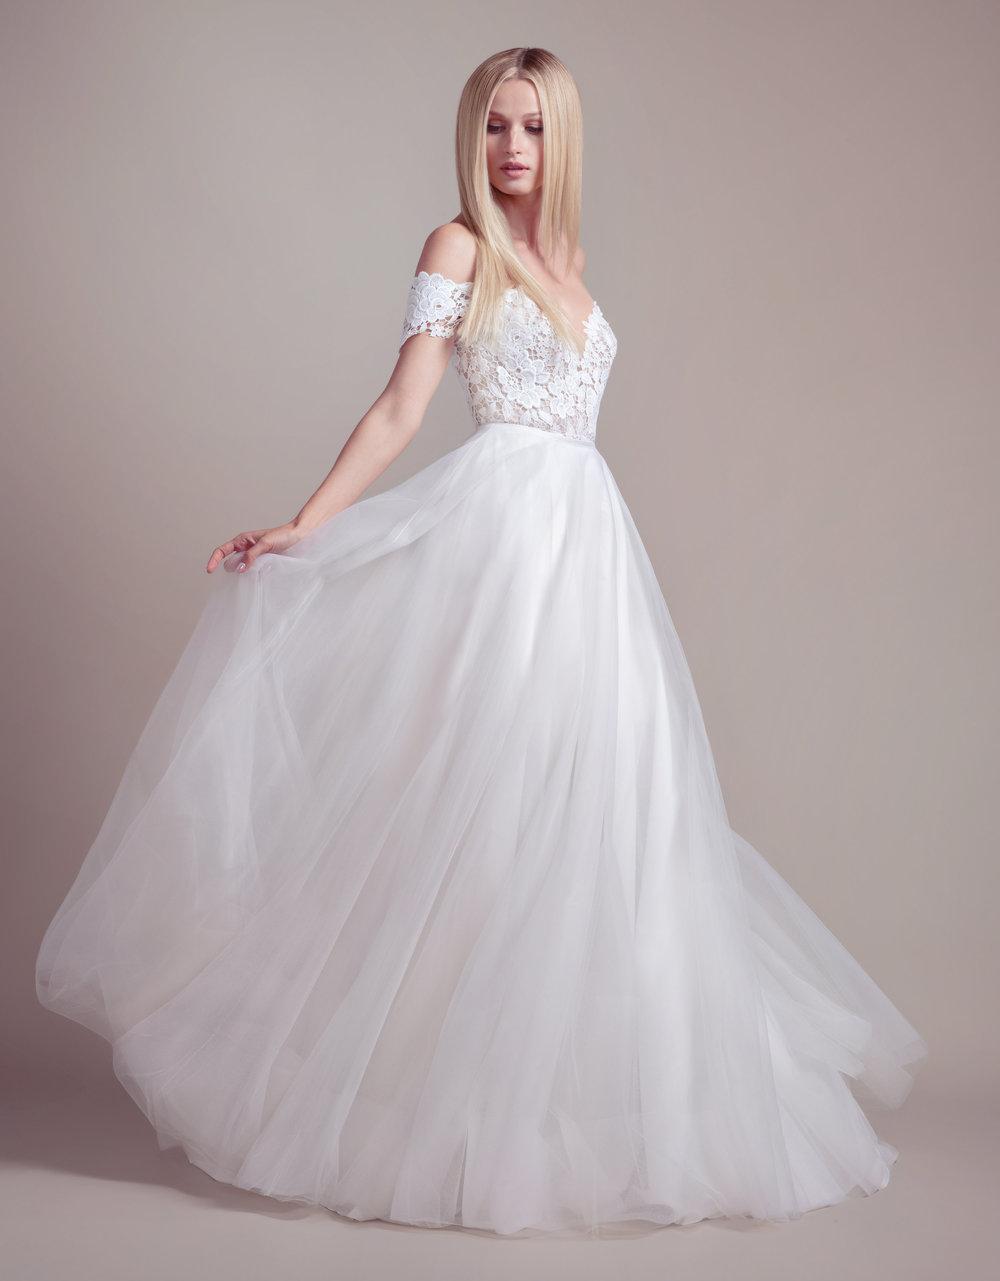 blush-hayley-paige-bridal-spring-2019-style-1908-jojo_0.jpg